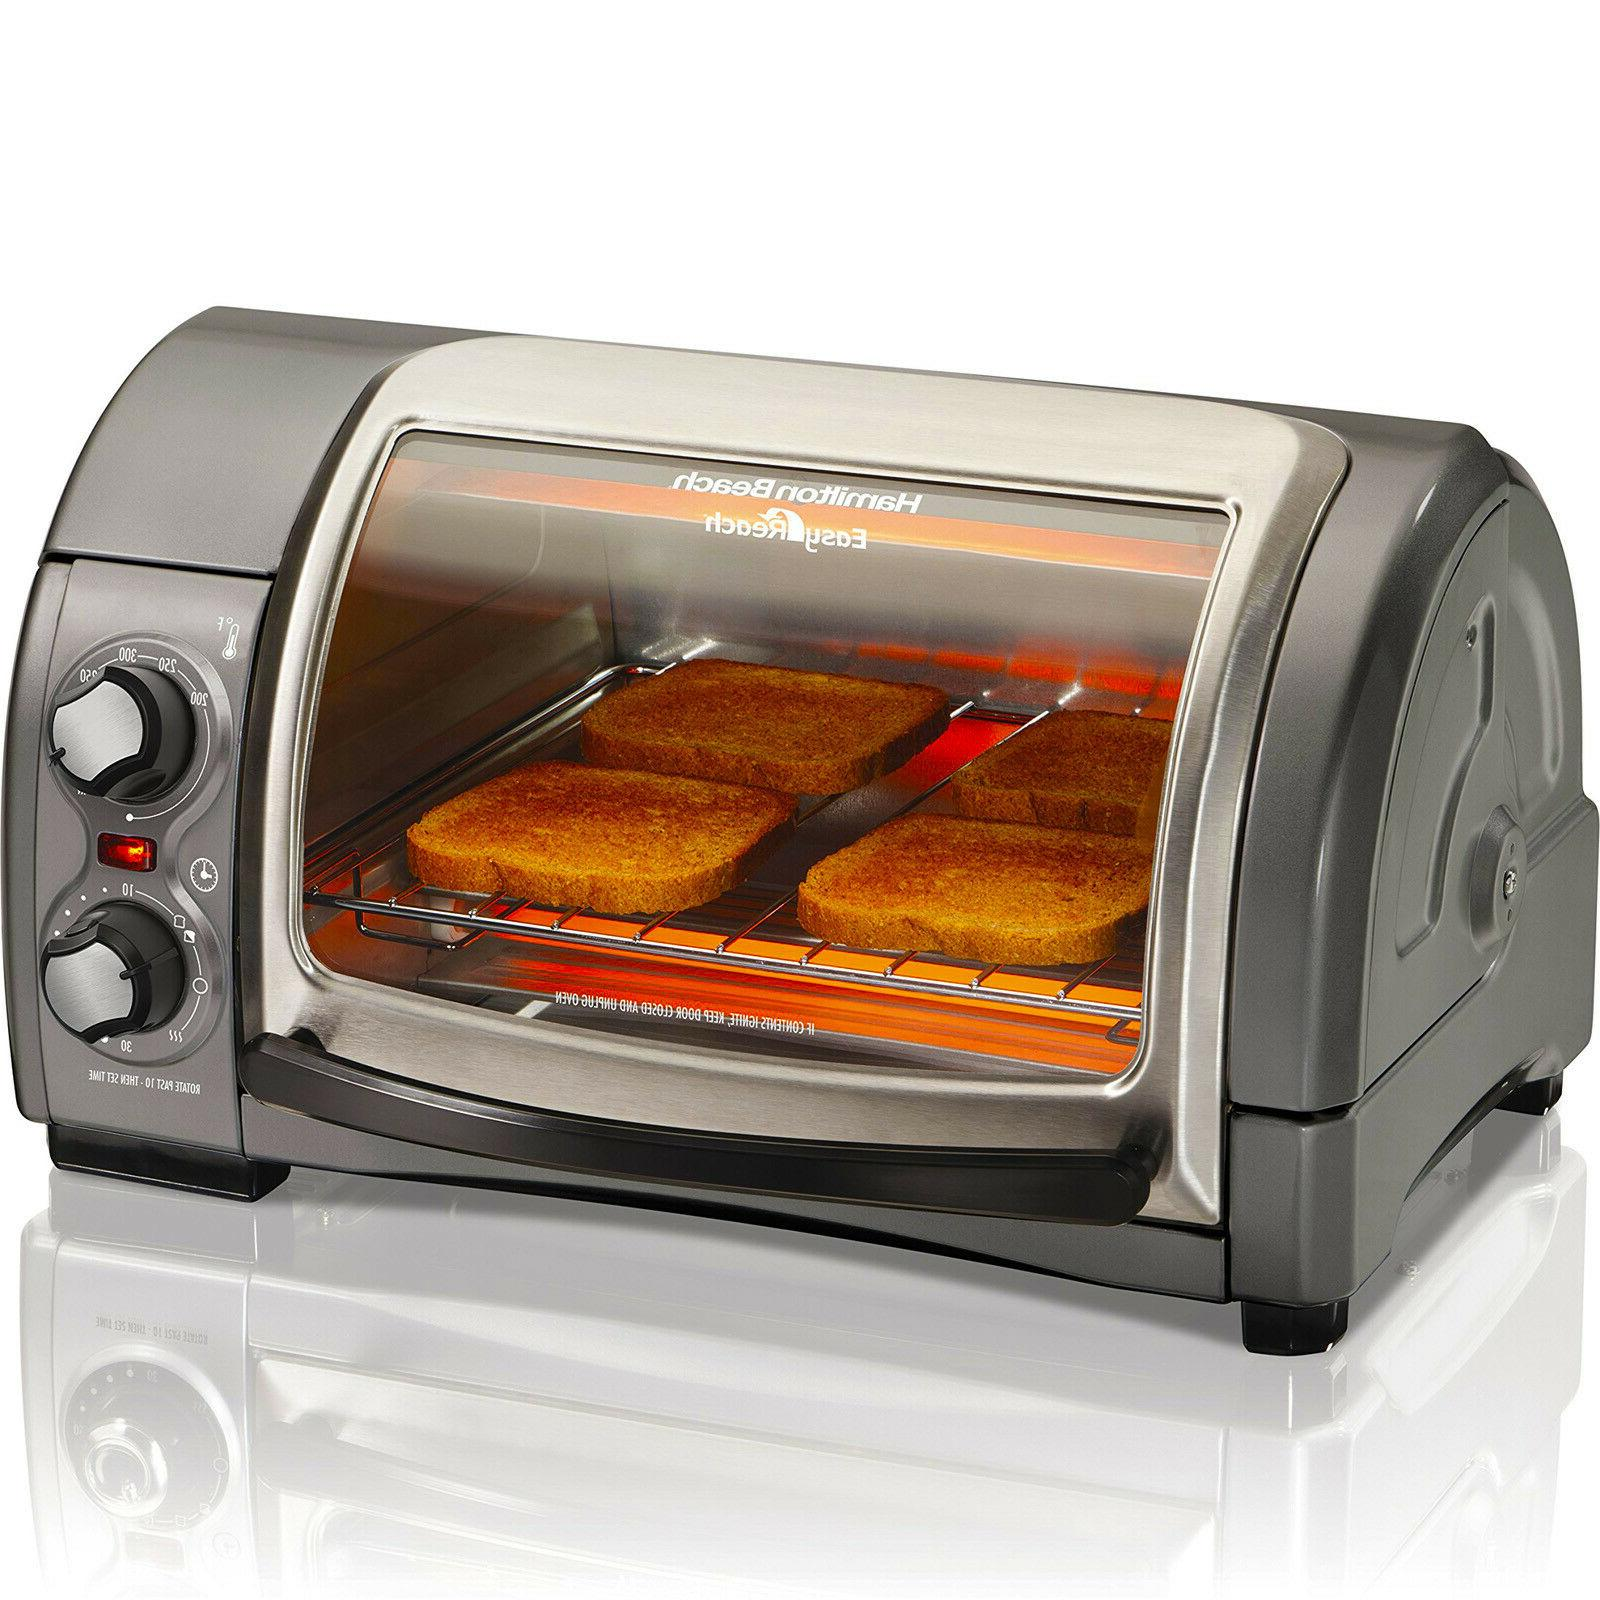 easy reach 4 slice toaster